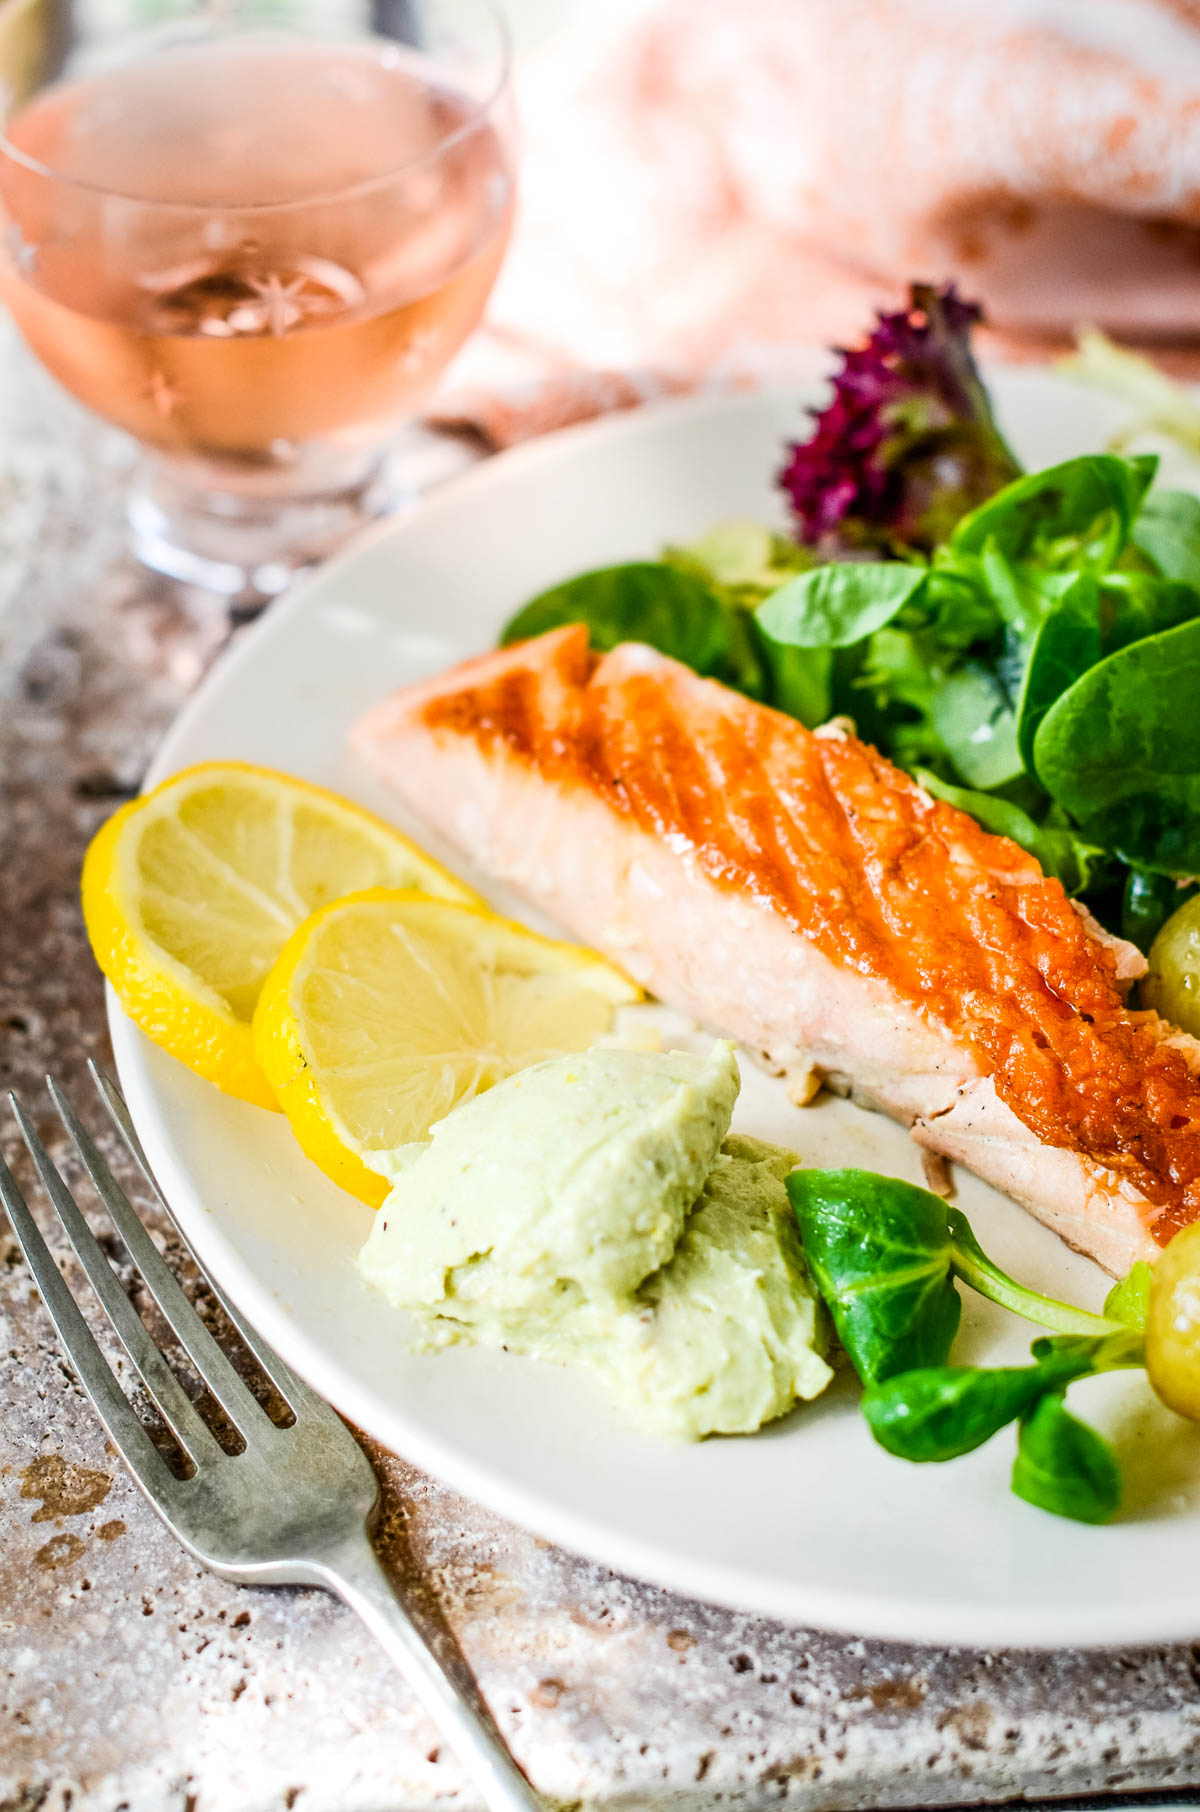 avocado dip with seared salmon and lemon